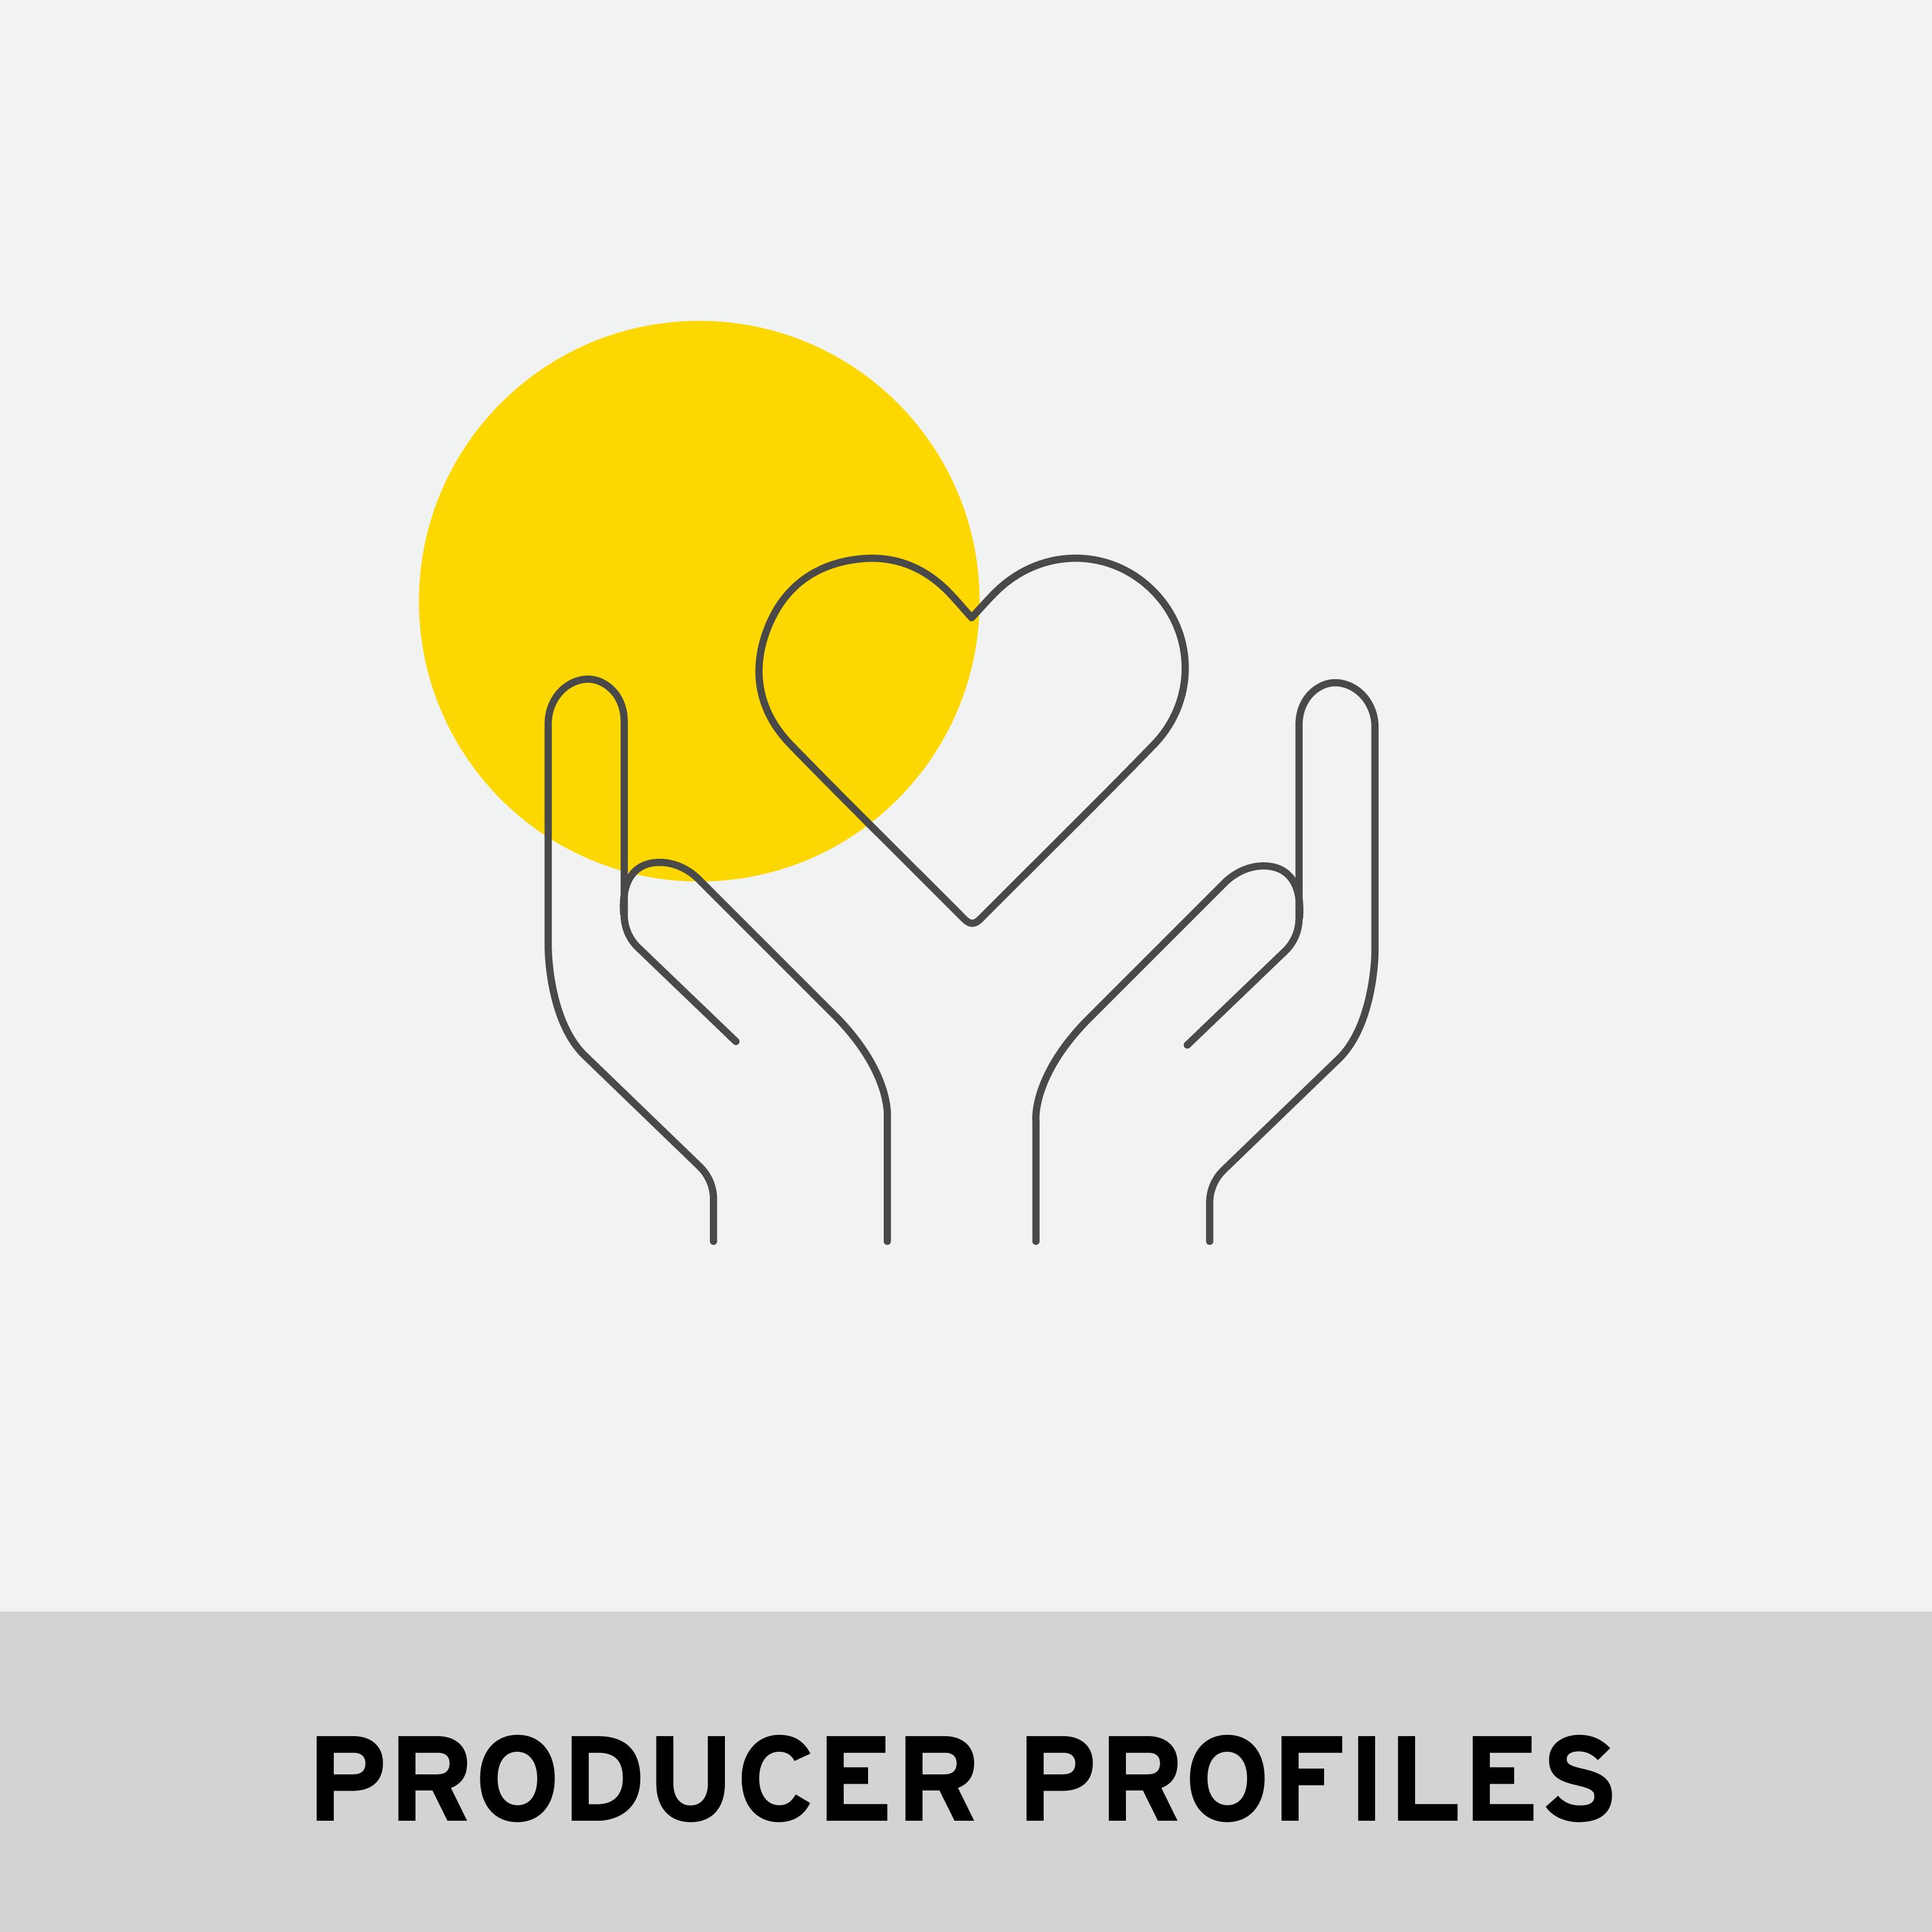 PRODUCER PROFILES